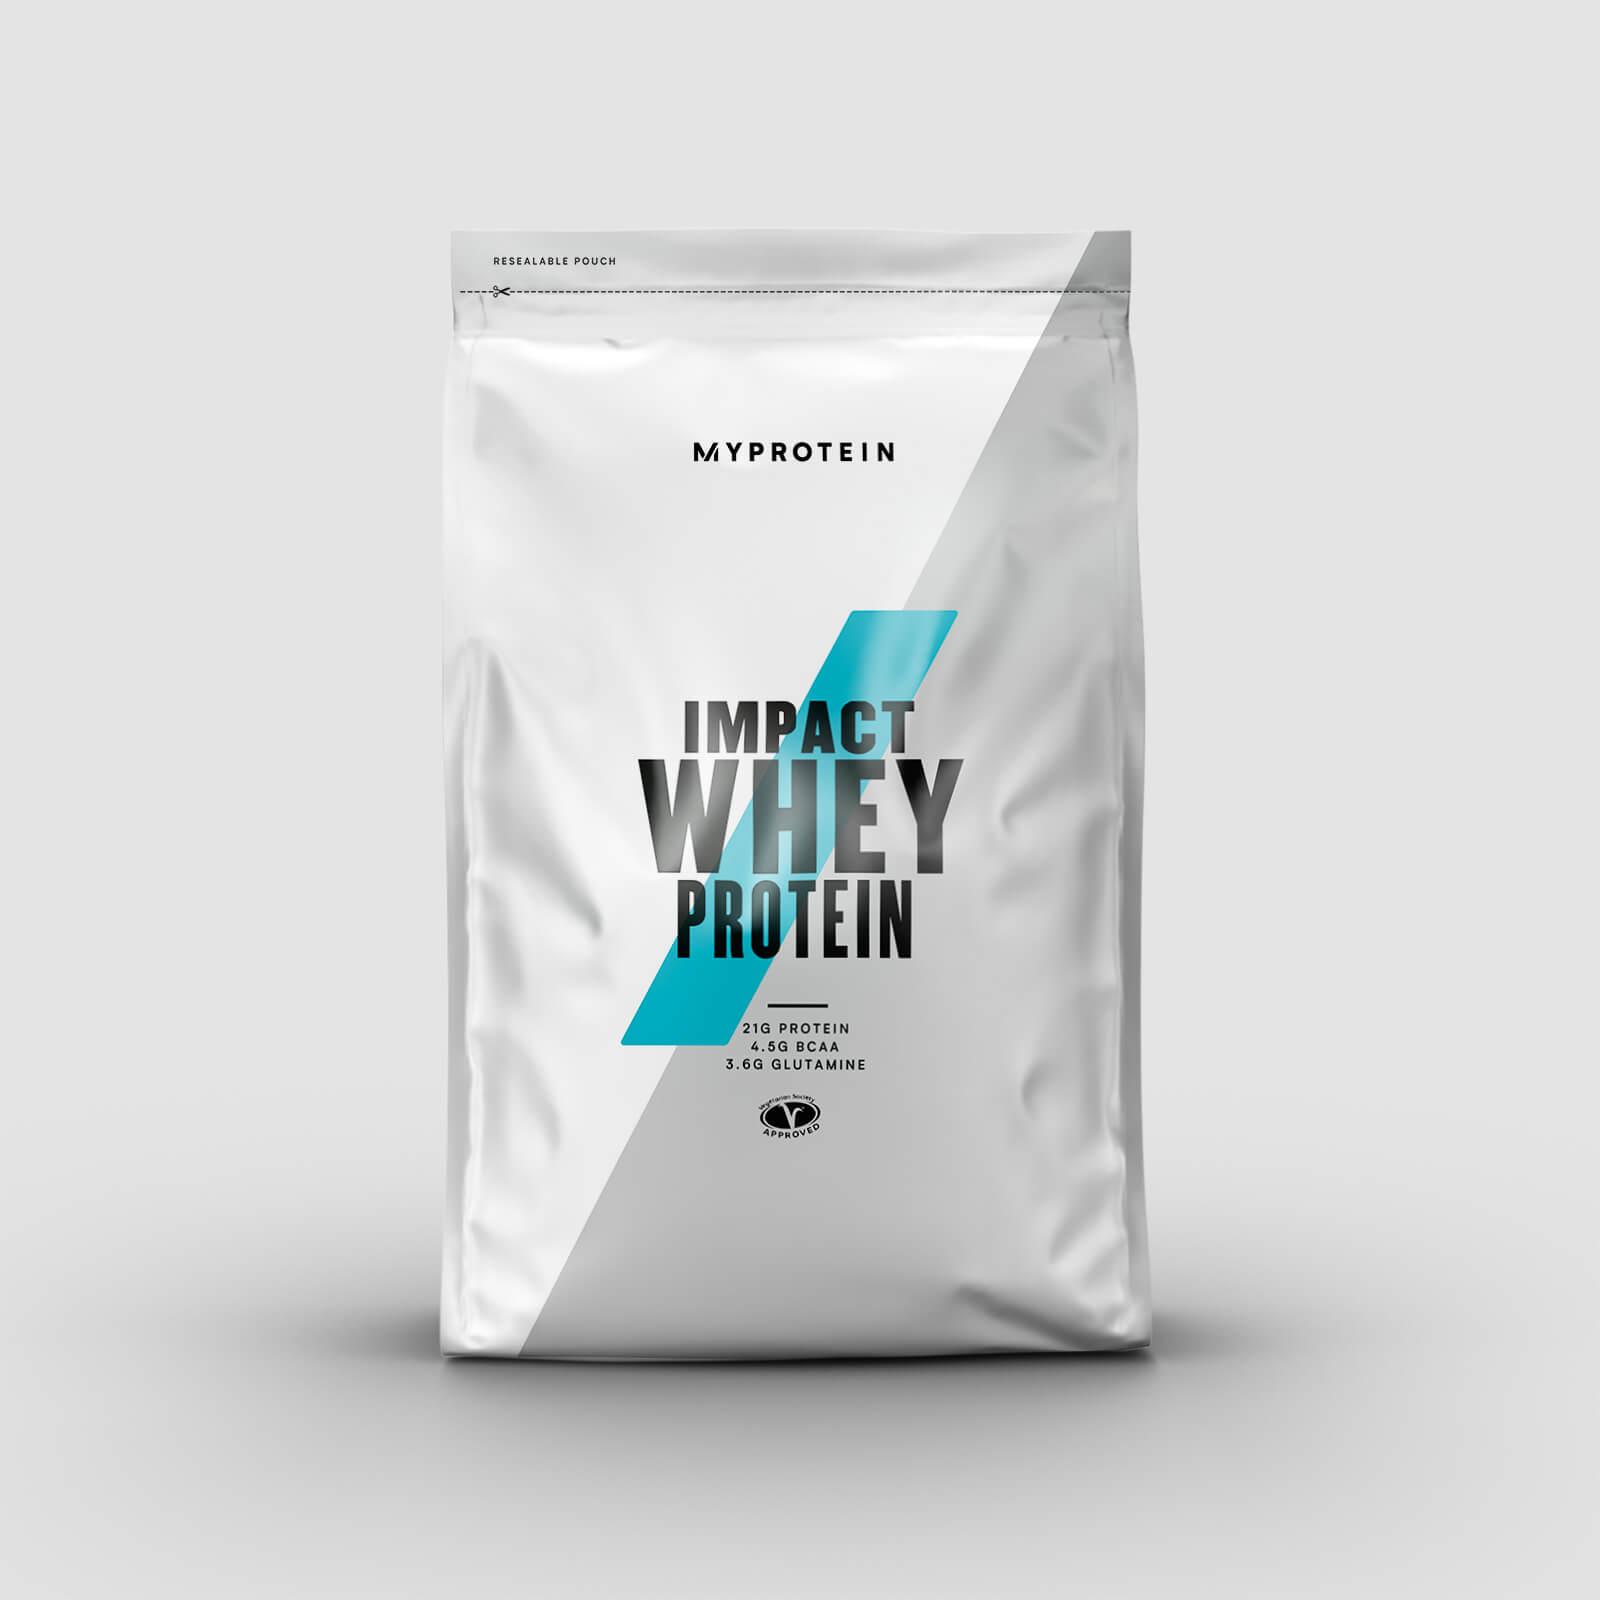 Myprotein Impact Whey Protein - 1kg - Gateau sauce Toffee